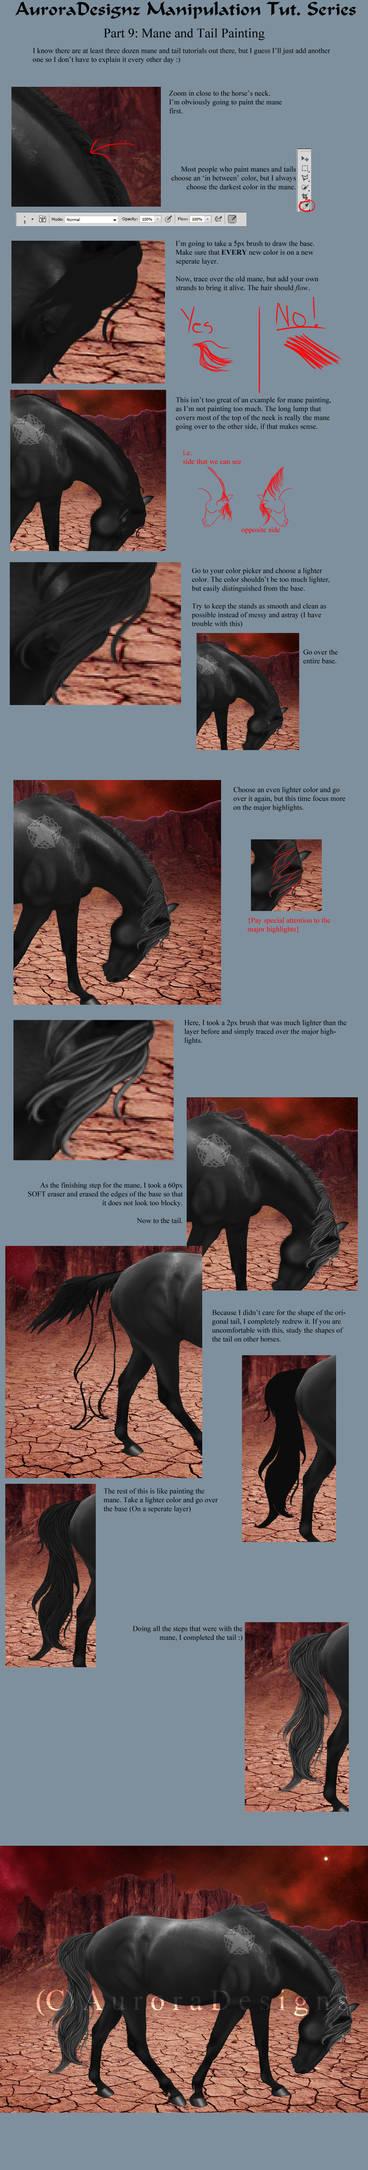 AuroraTutSeries Part 9: Mane and Tail Painting